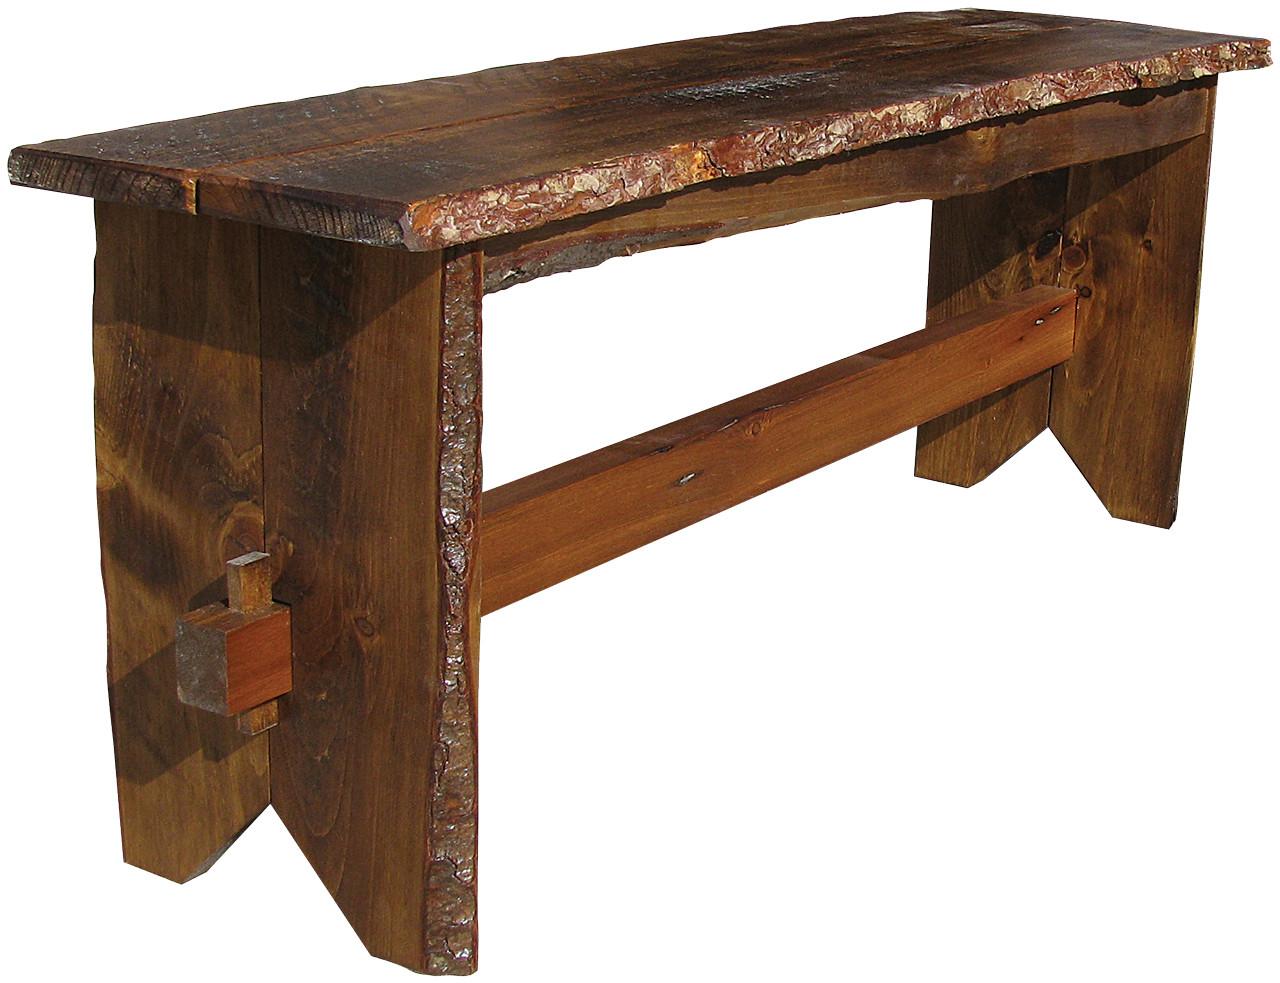 Fantastic Rustic Trestle Bench 4 Long Overstock Inzonedesignstudio Interior Chair Design Inzonedesignstudiocom